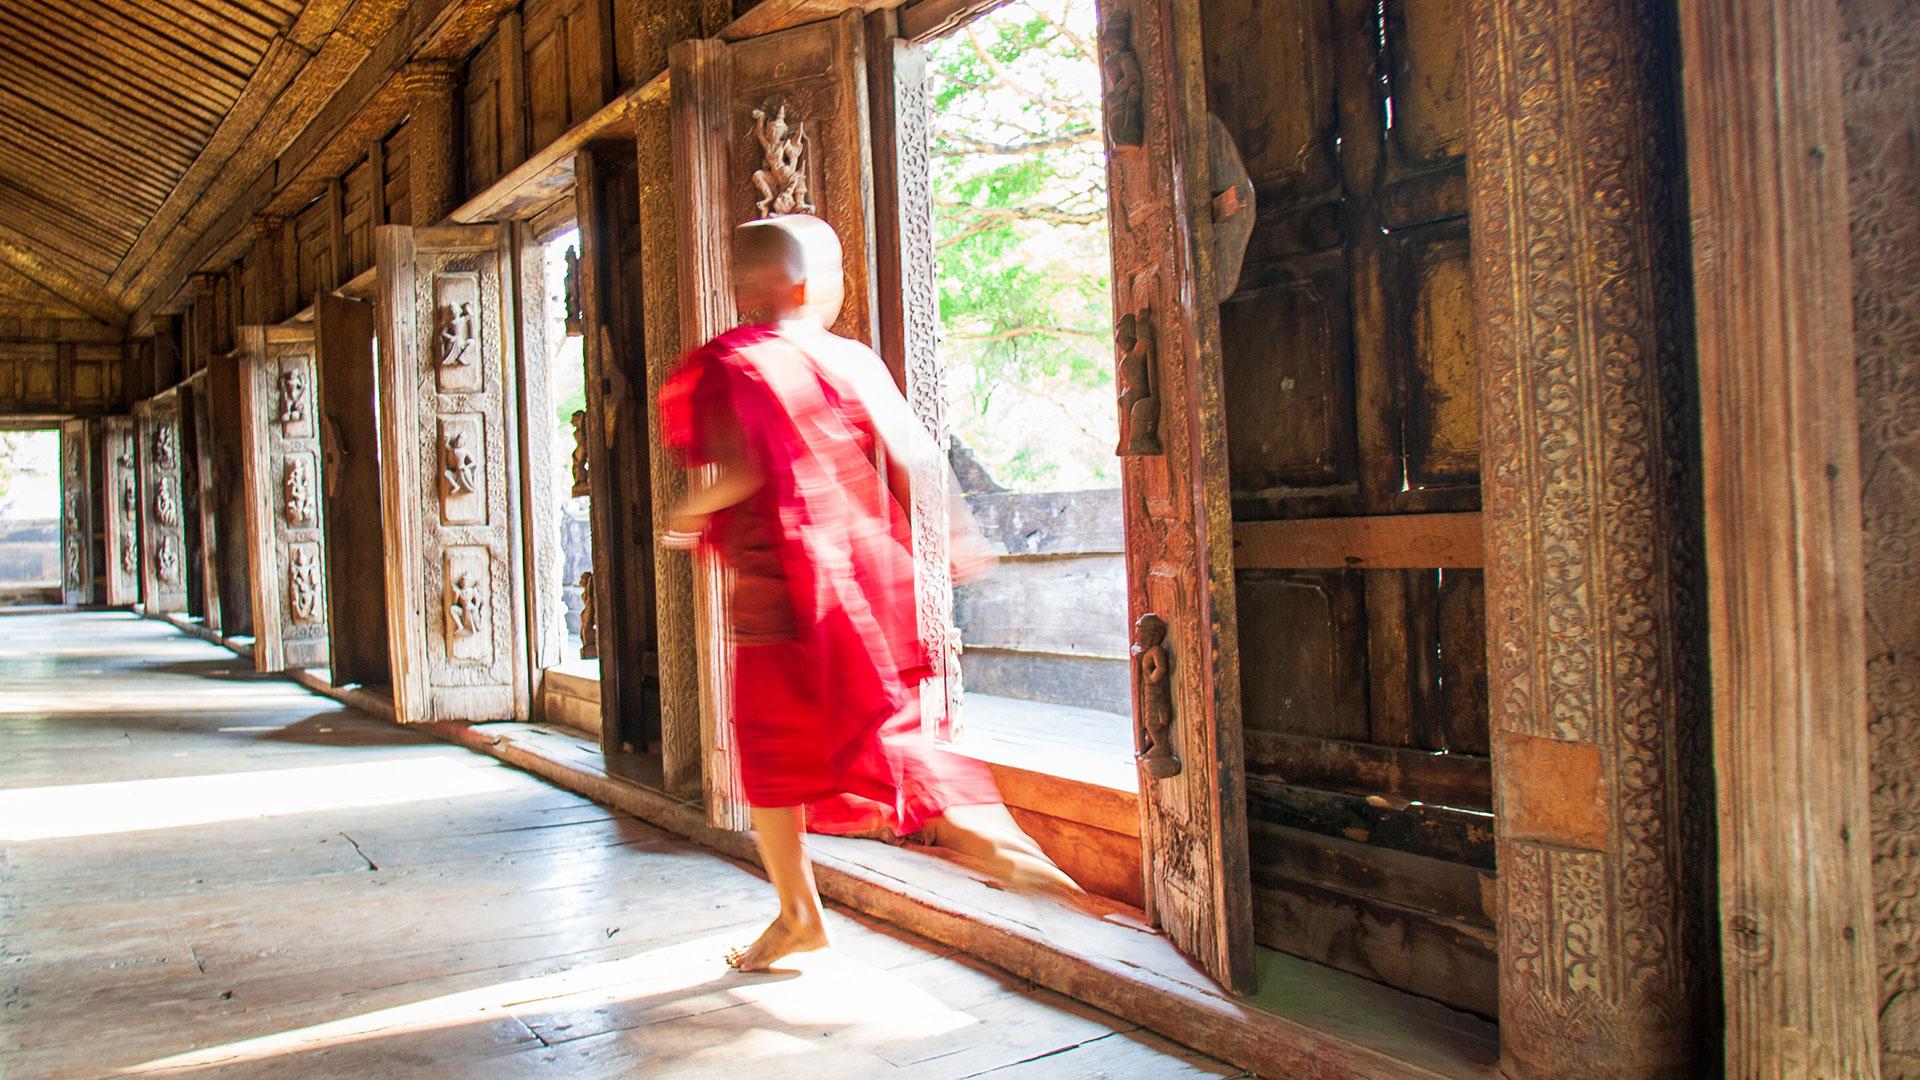 Monk runs down hallway in Mandalay, Myanmar